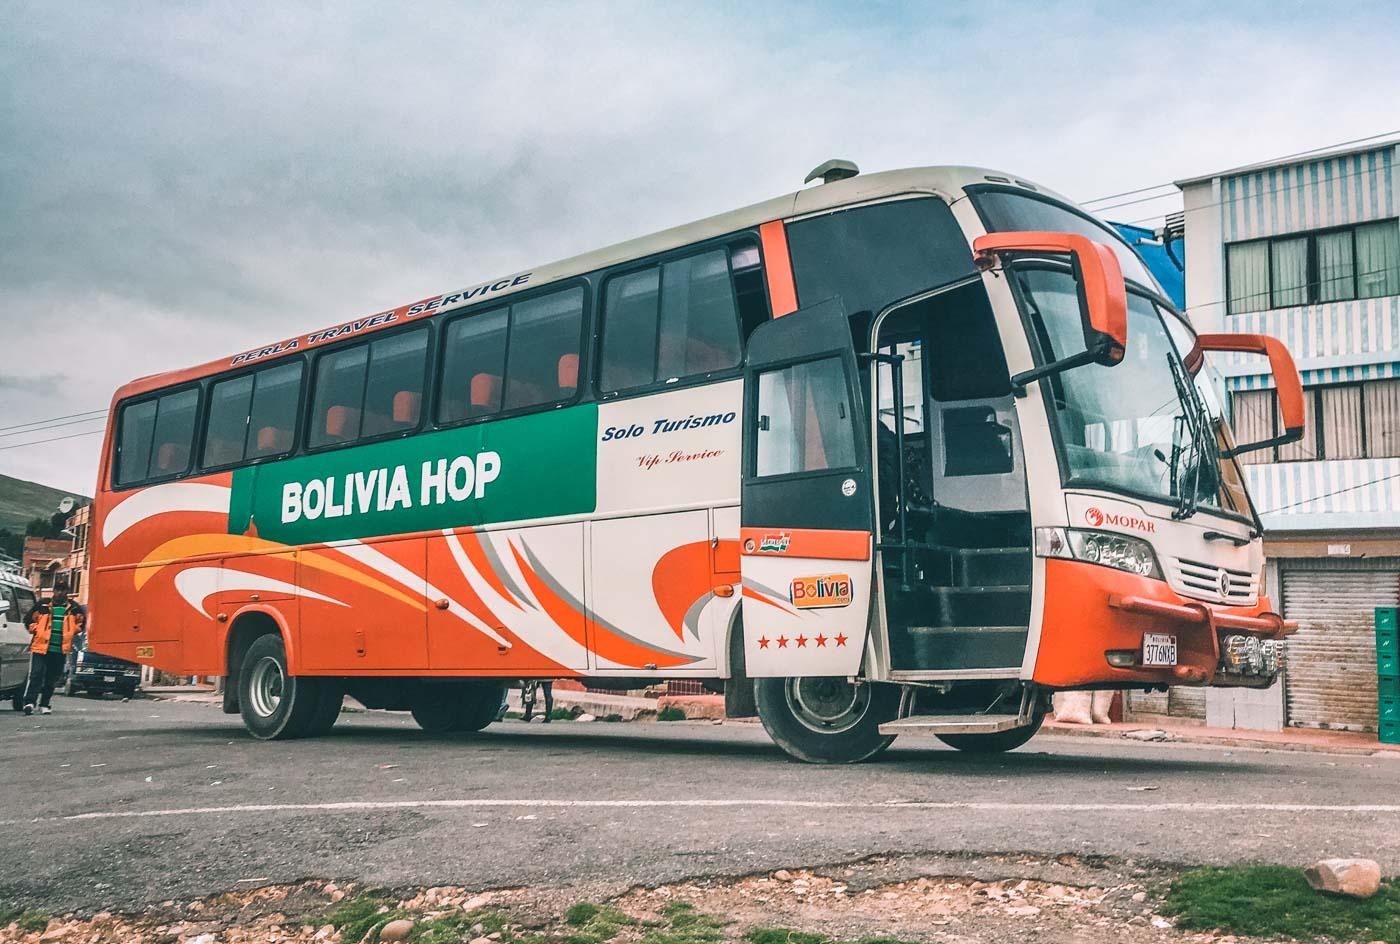 Our Bolivia Hop bus en route to Peru